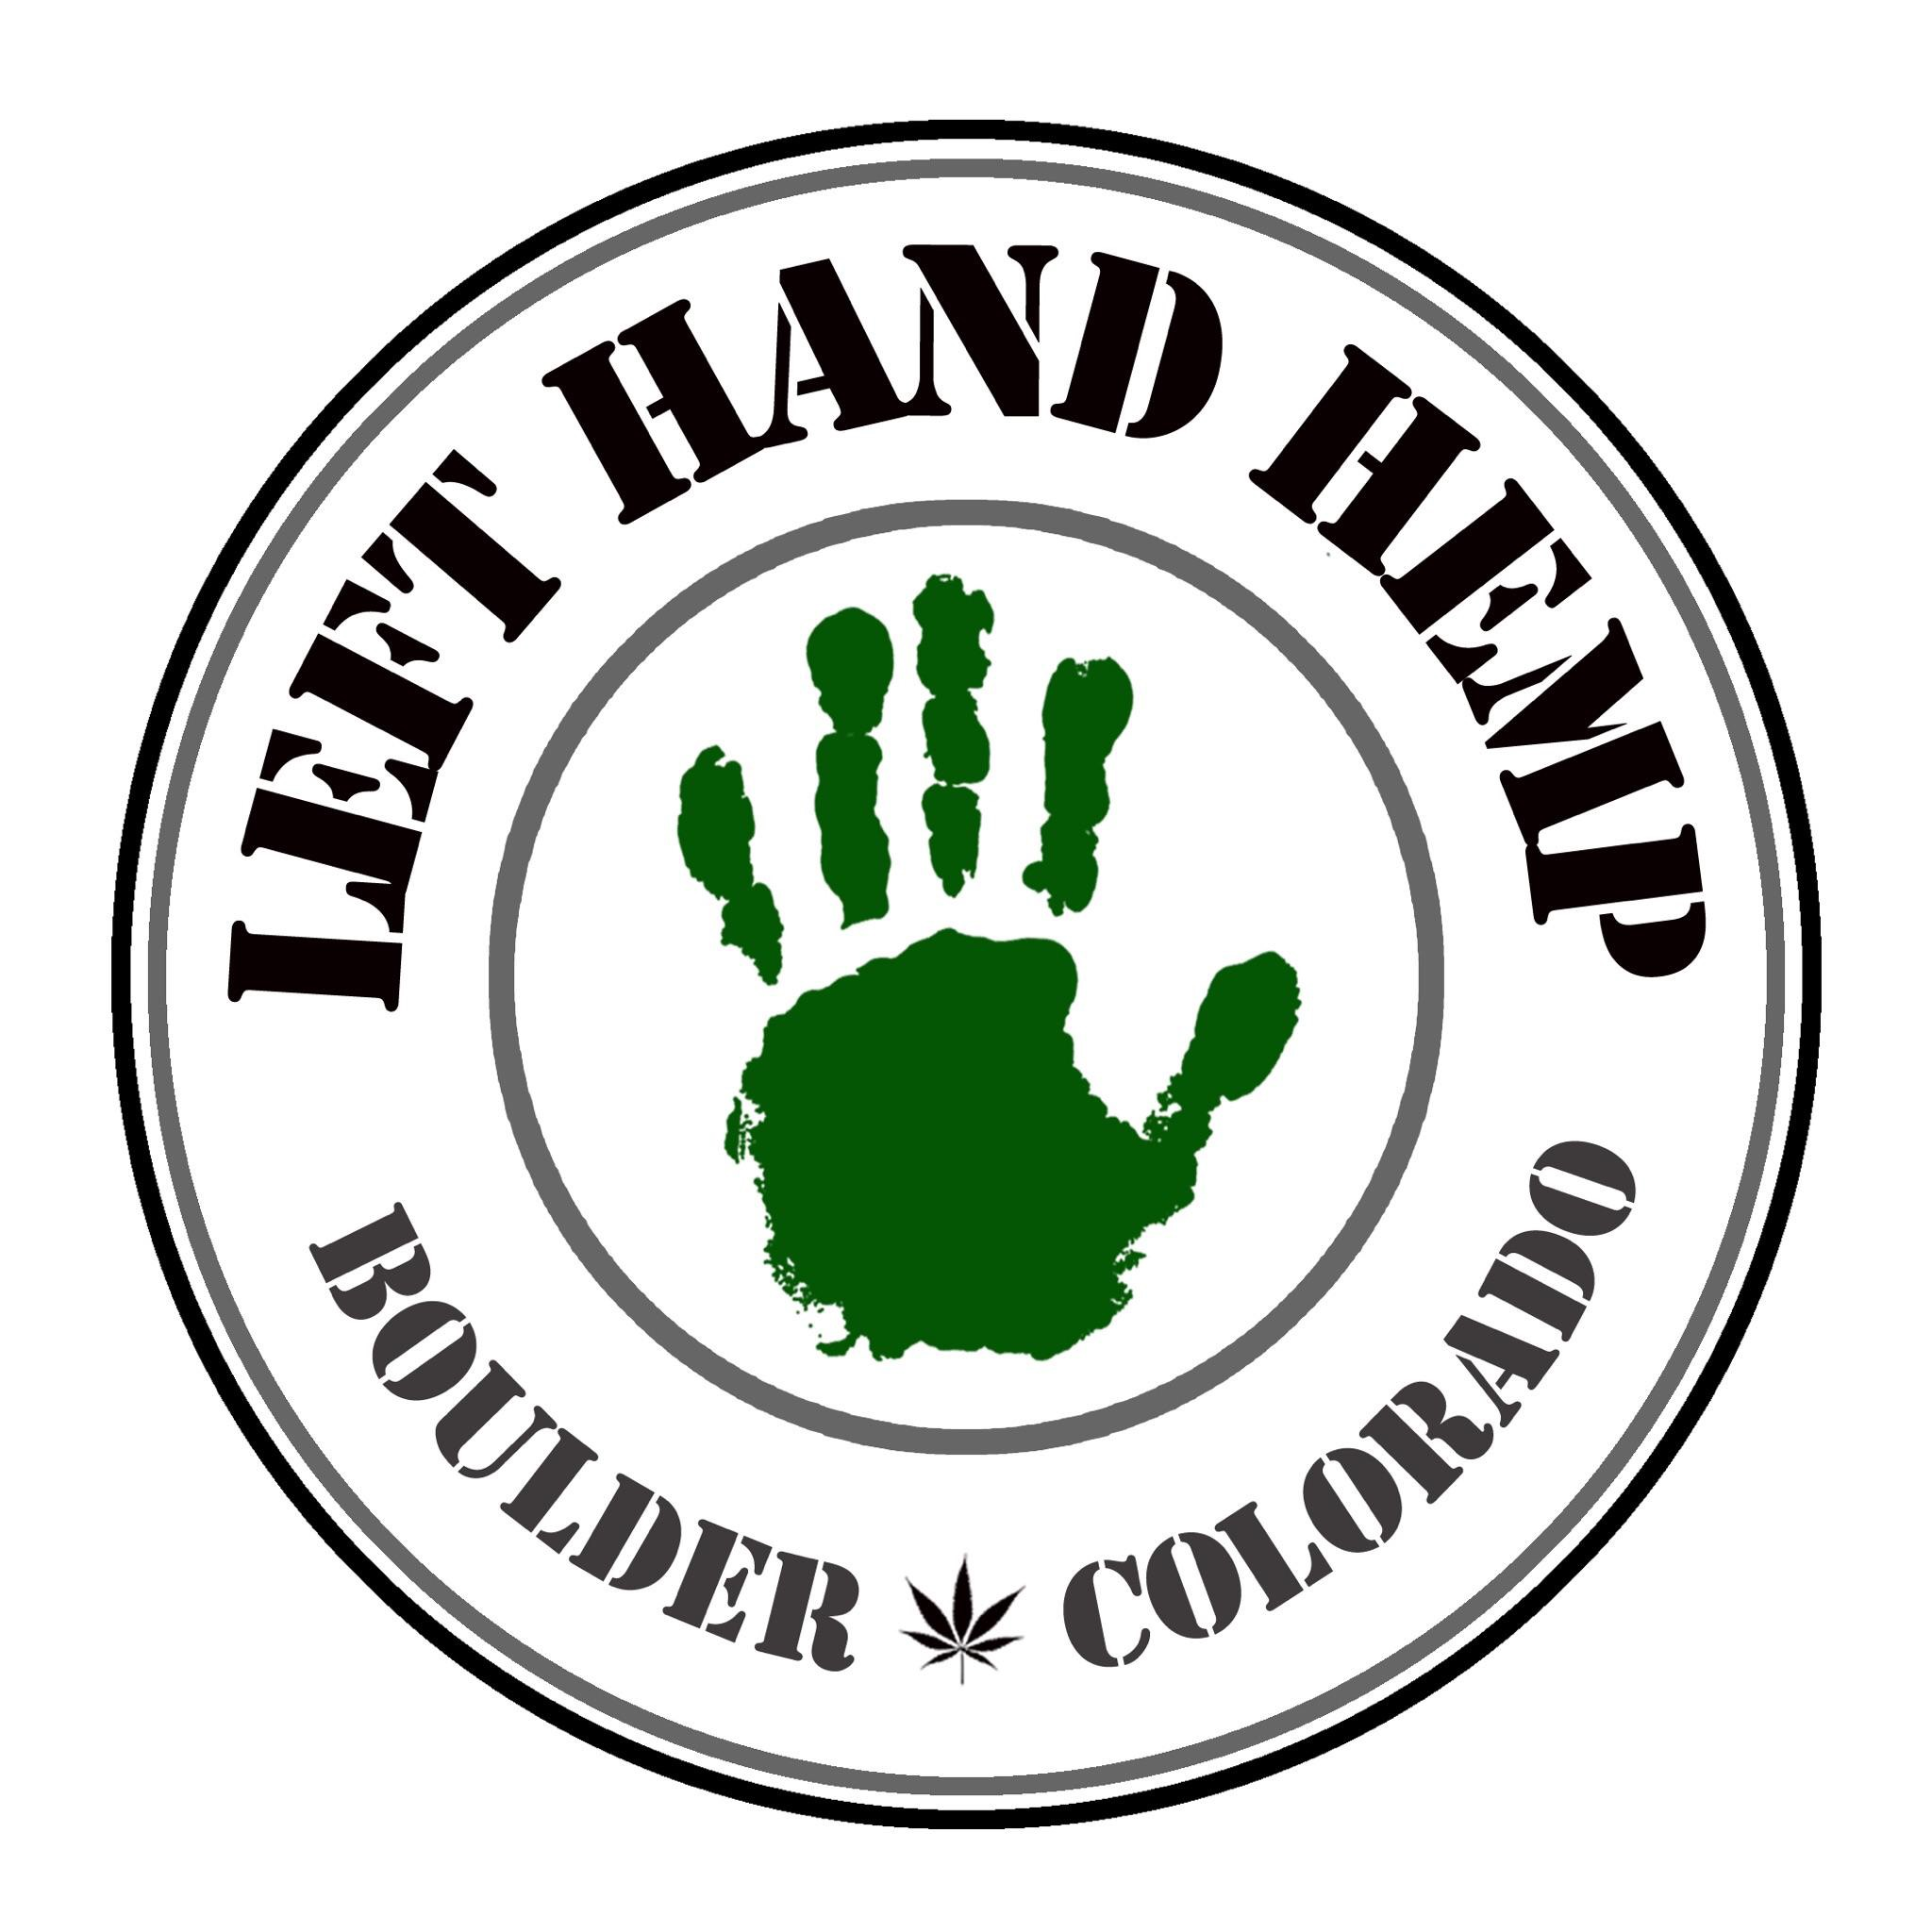 Left Hand Hemp